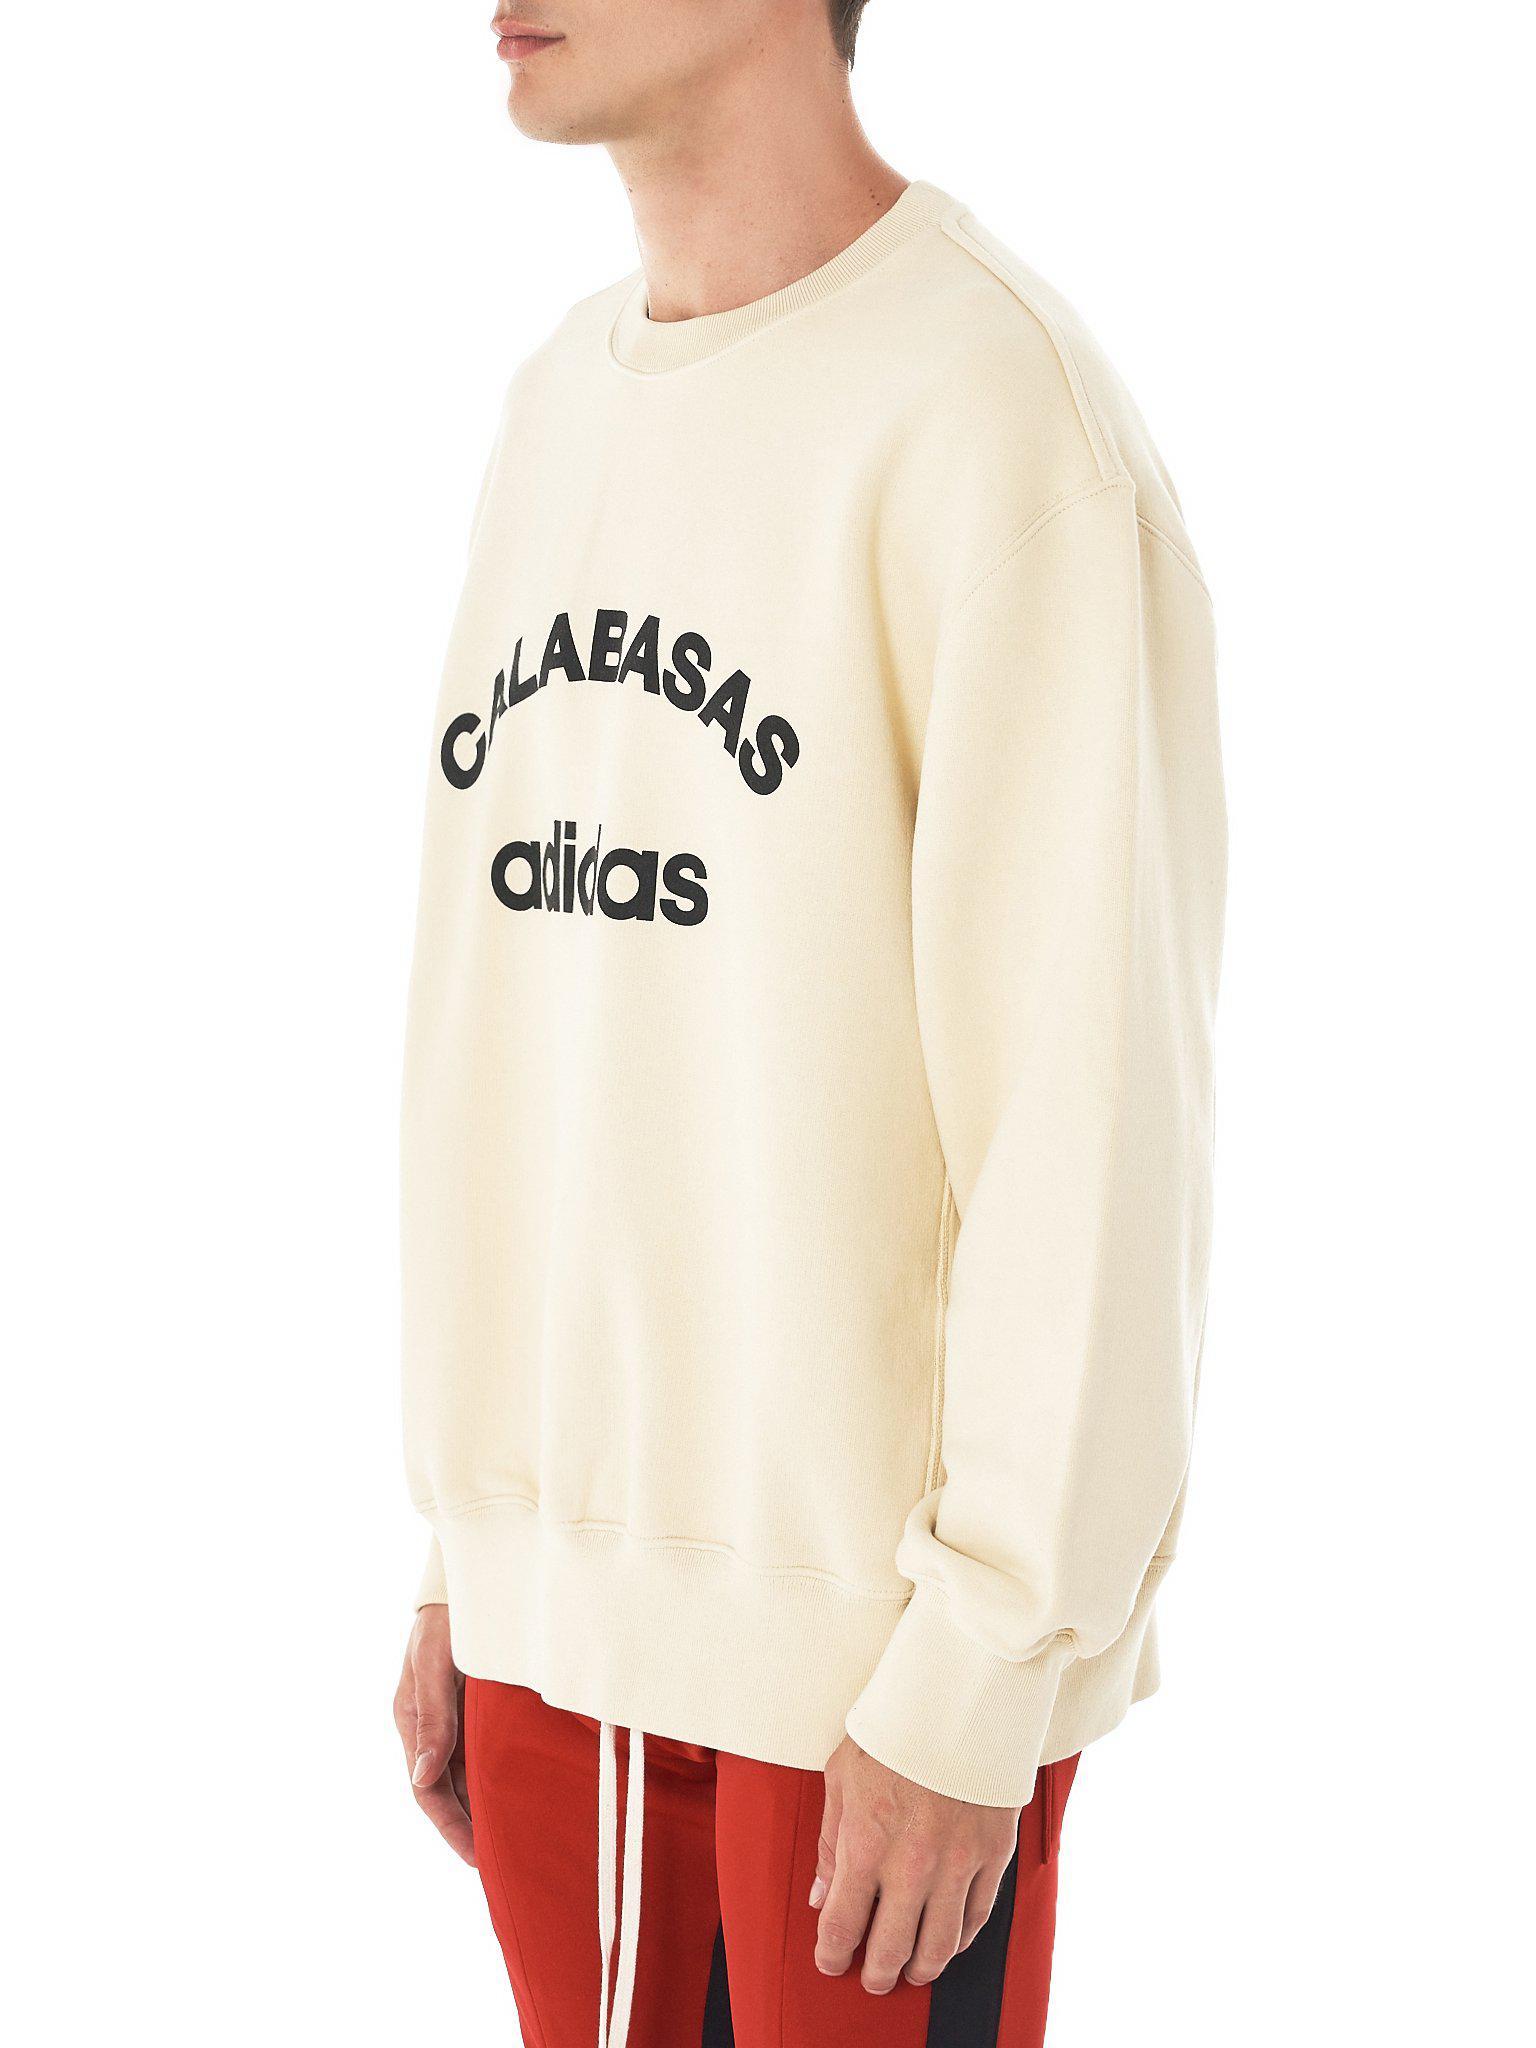 adidas calabasas hoodie